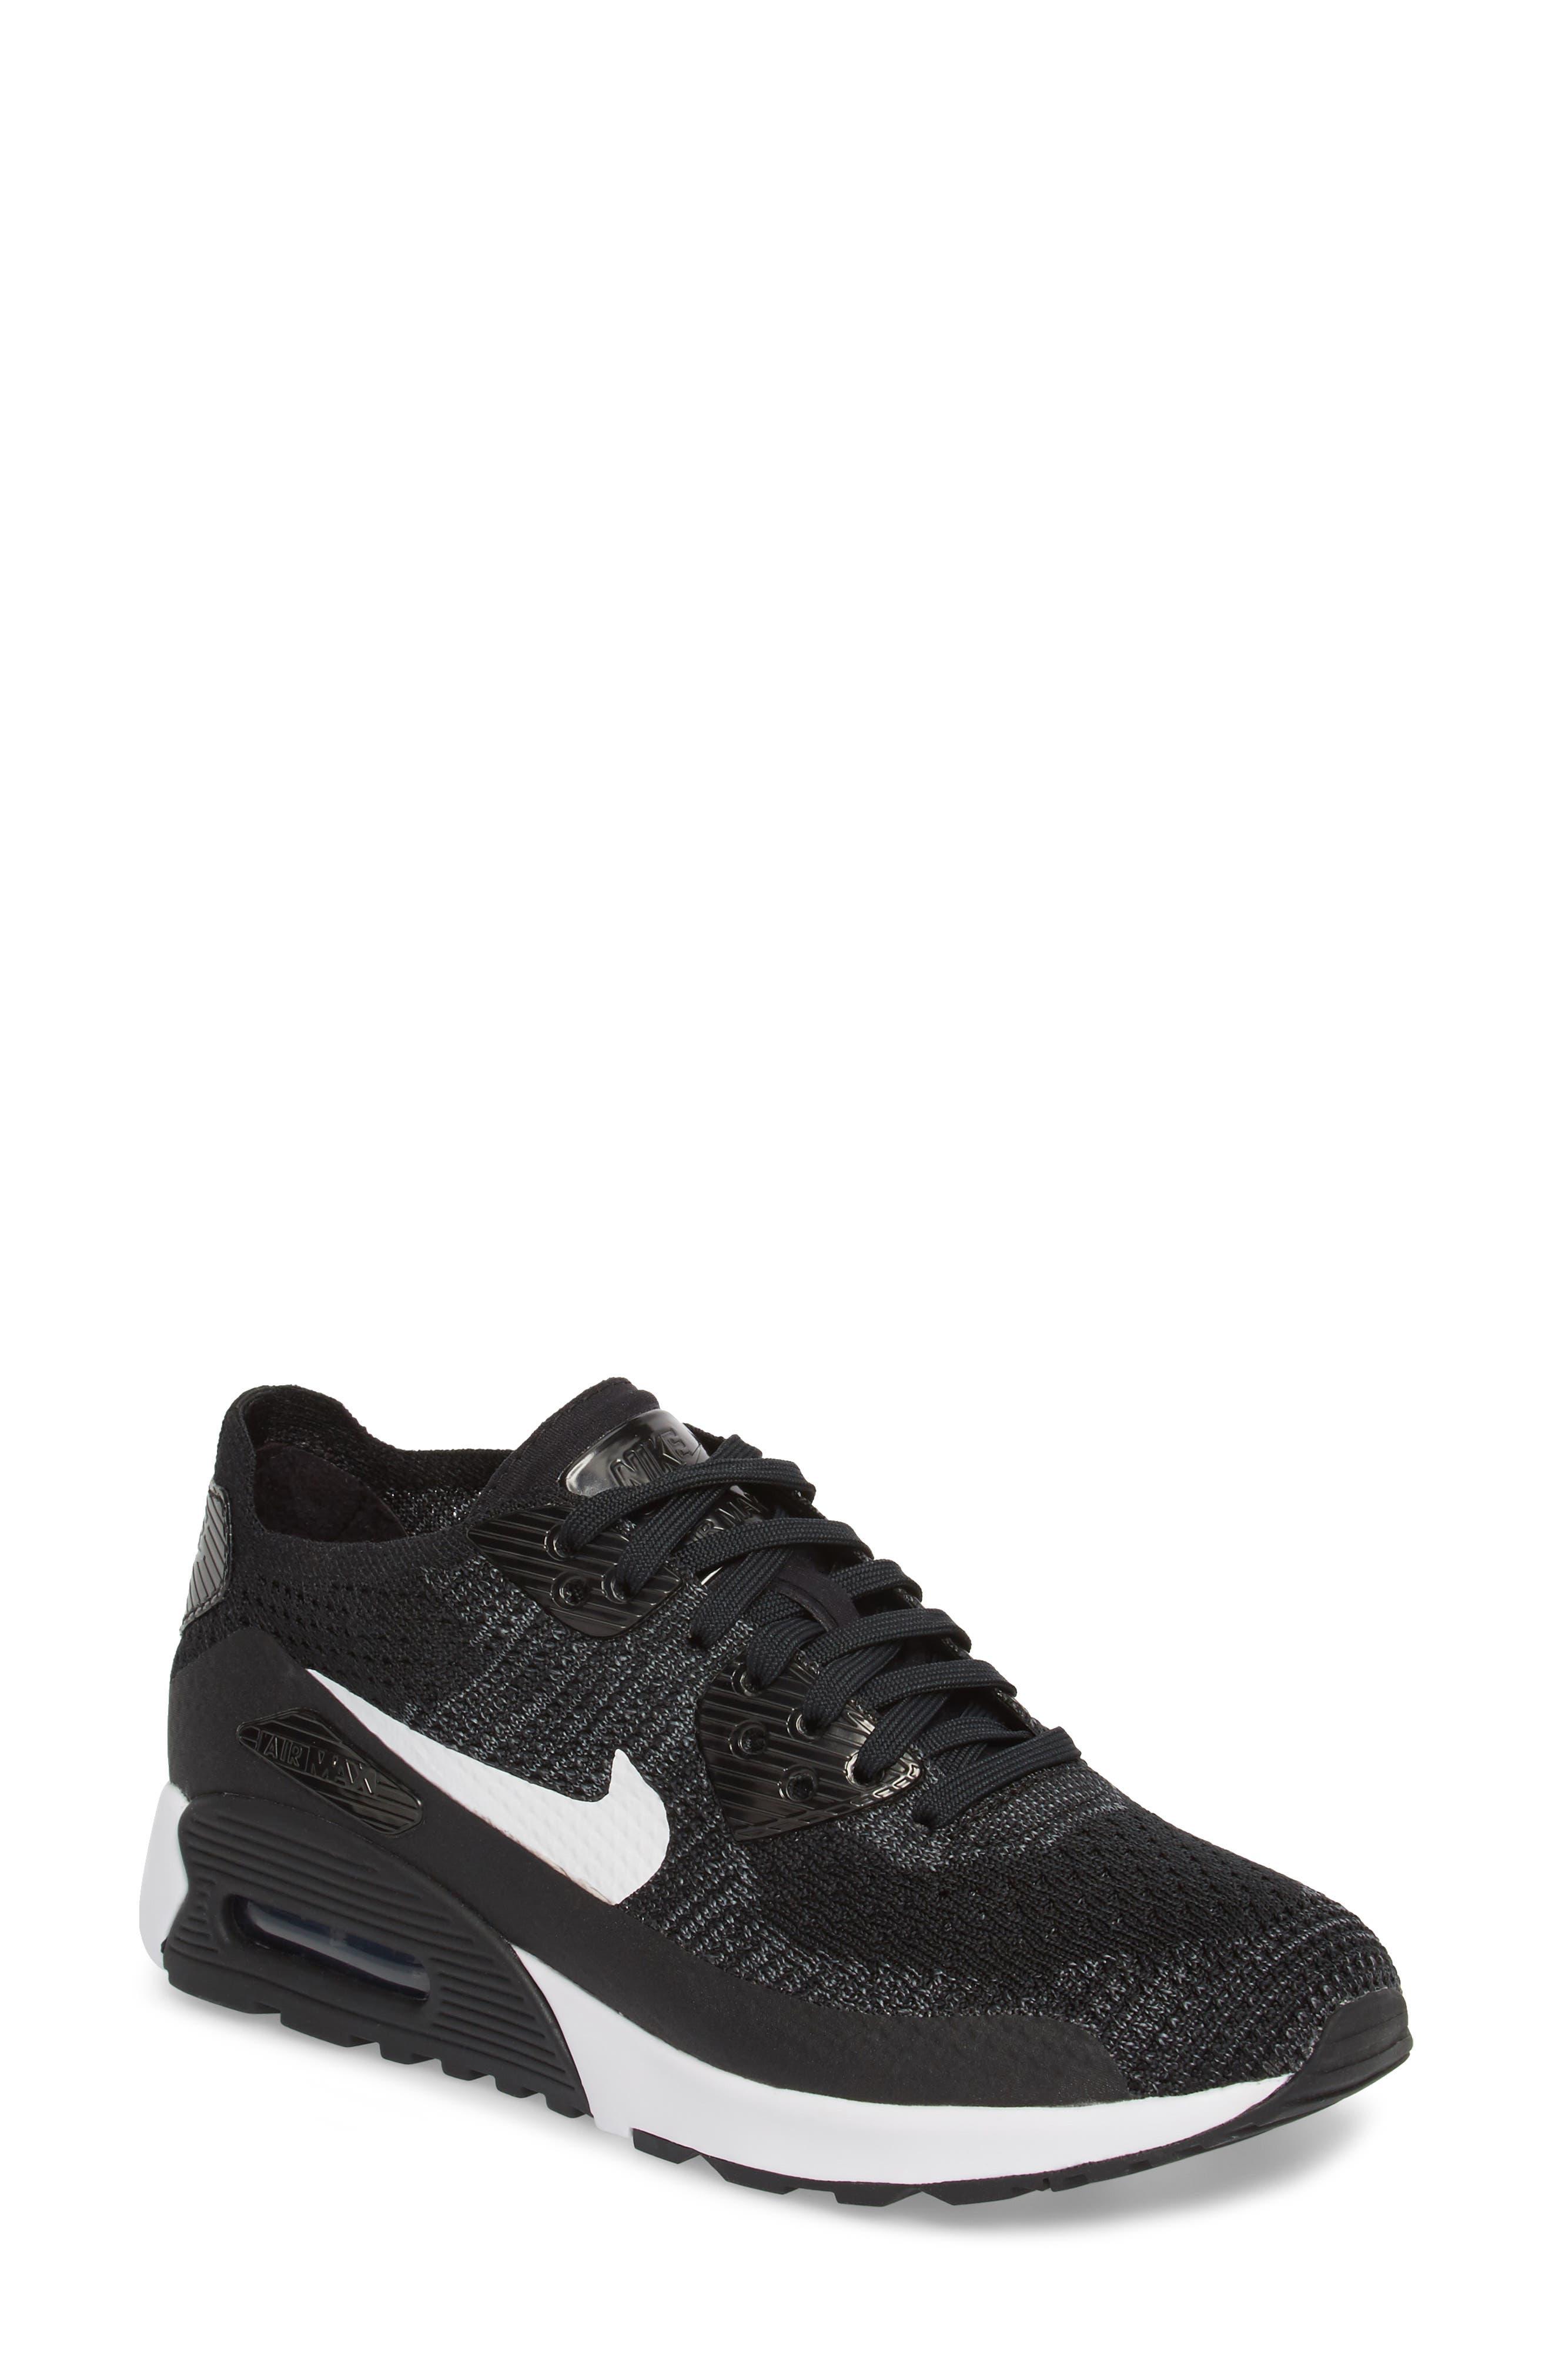 Air Max 90 Flyknit Ultra 2.0 Sneaker,                             Main thumbnail 1, color,                             Black/ White/ Dark Grey